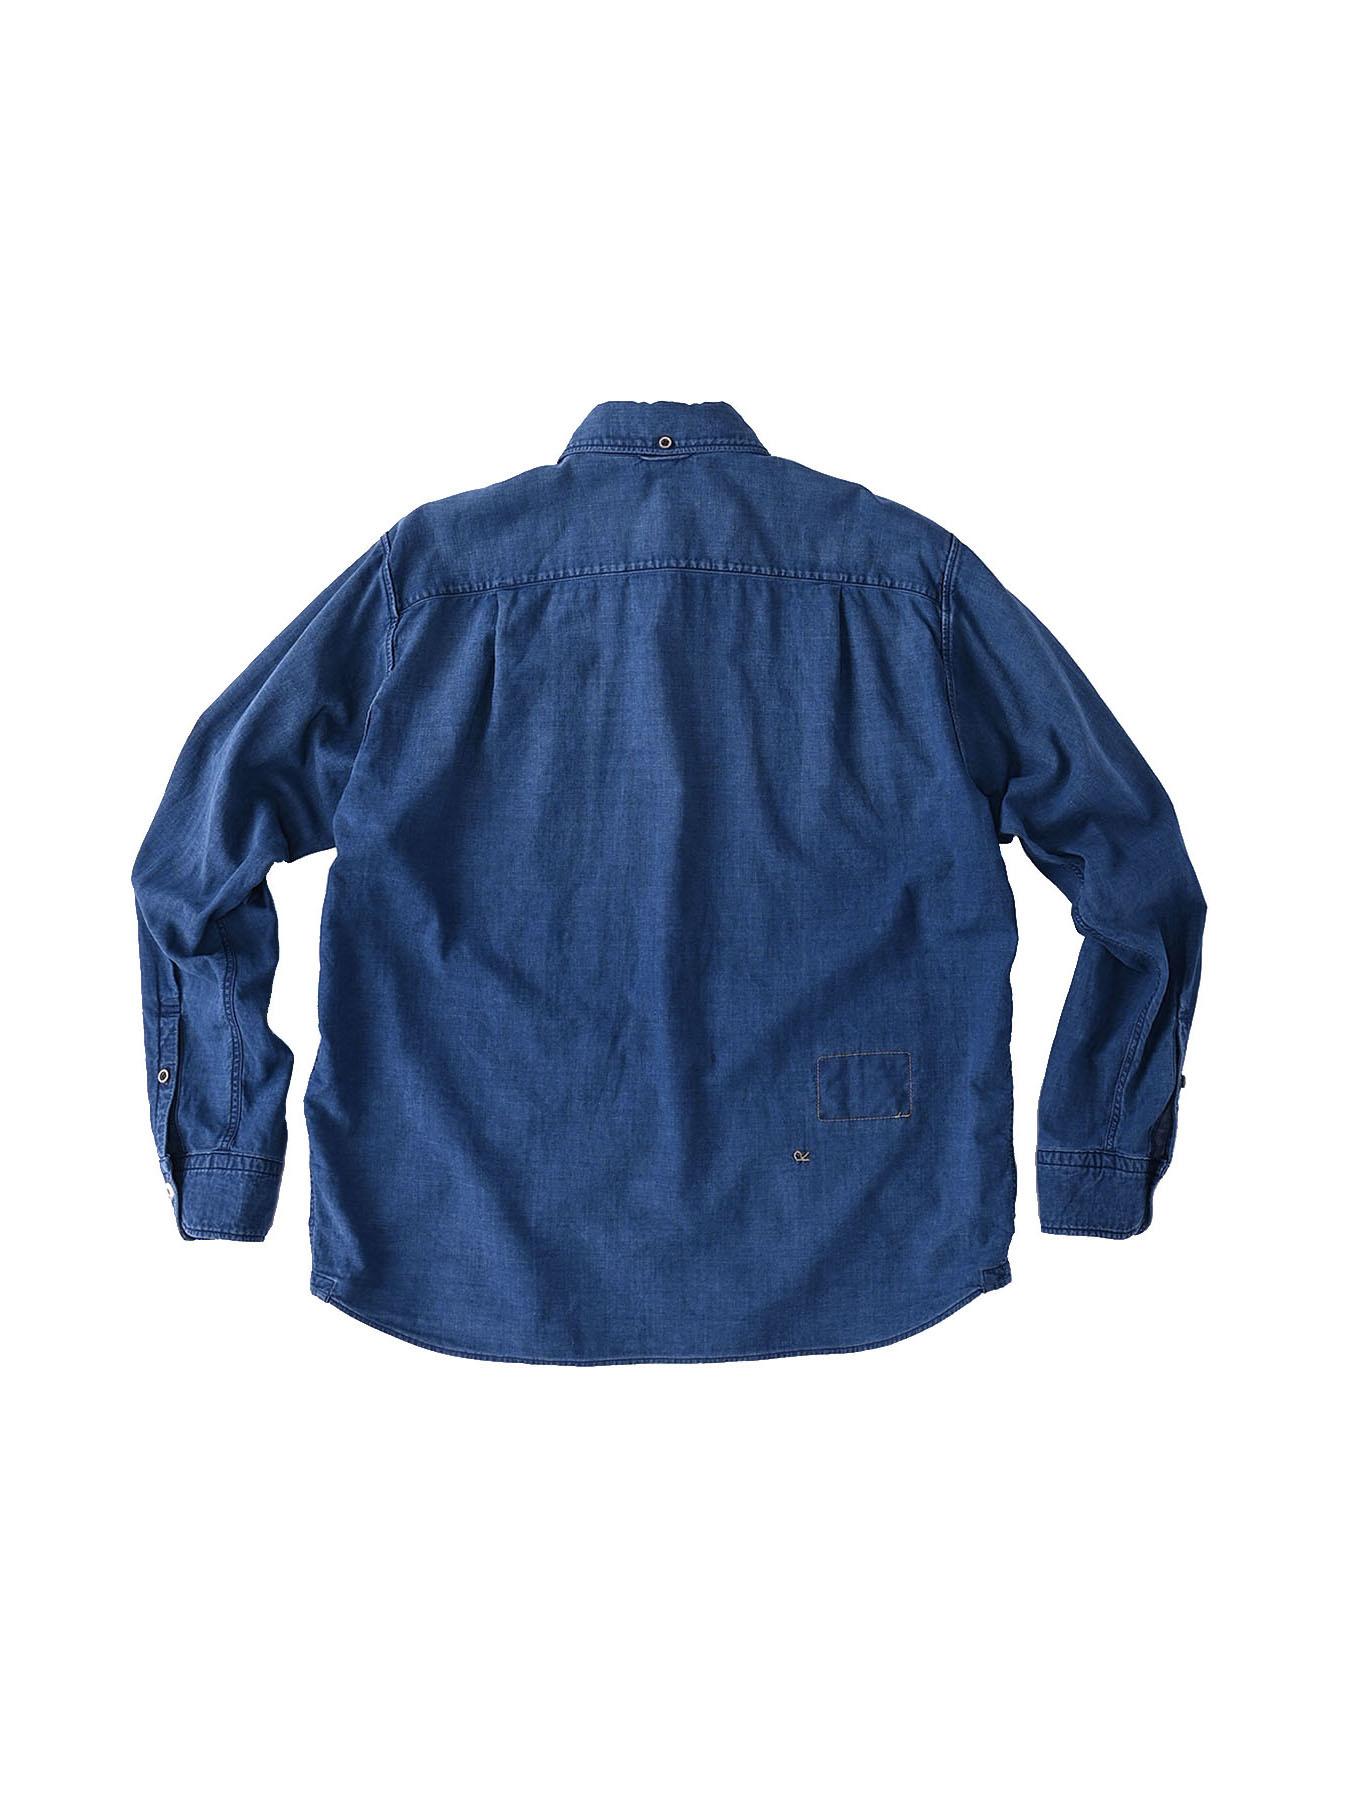 Indigo Gauze 908 Ocean Shirt Distressed-5